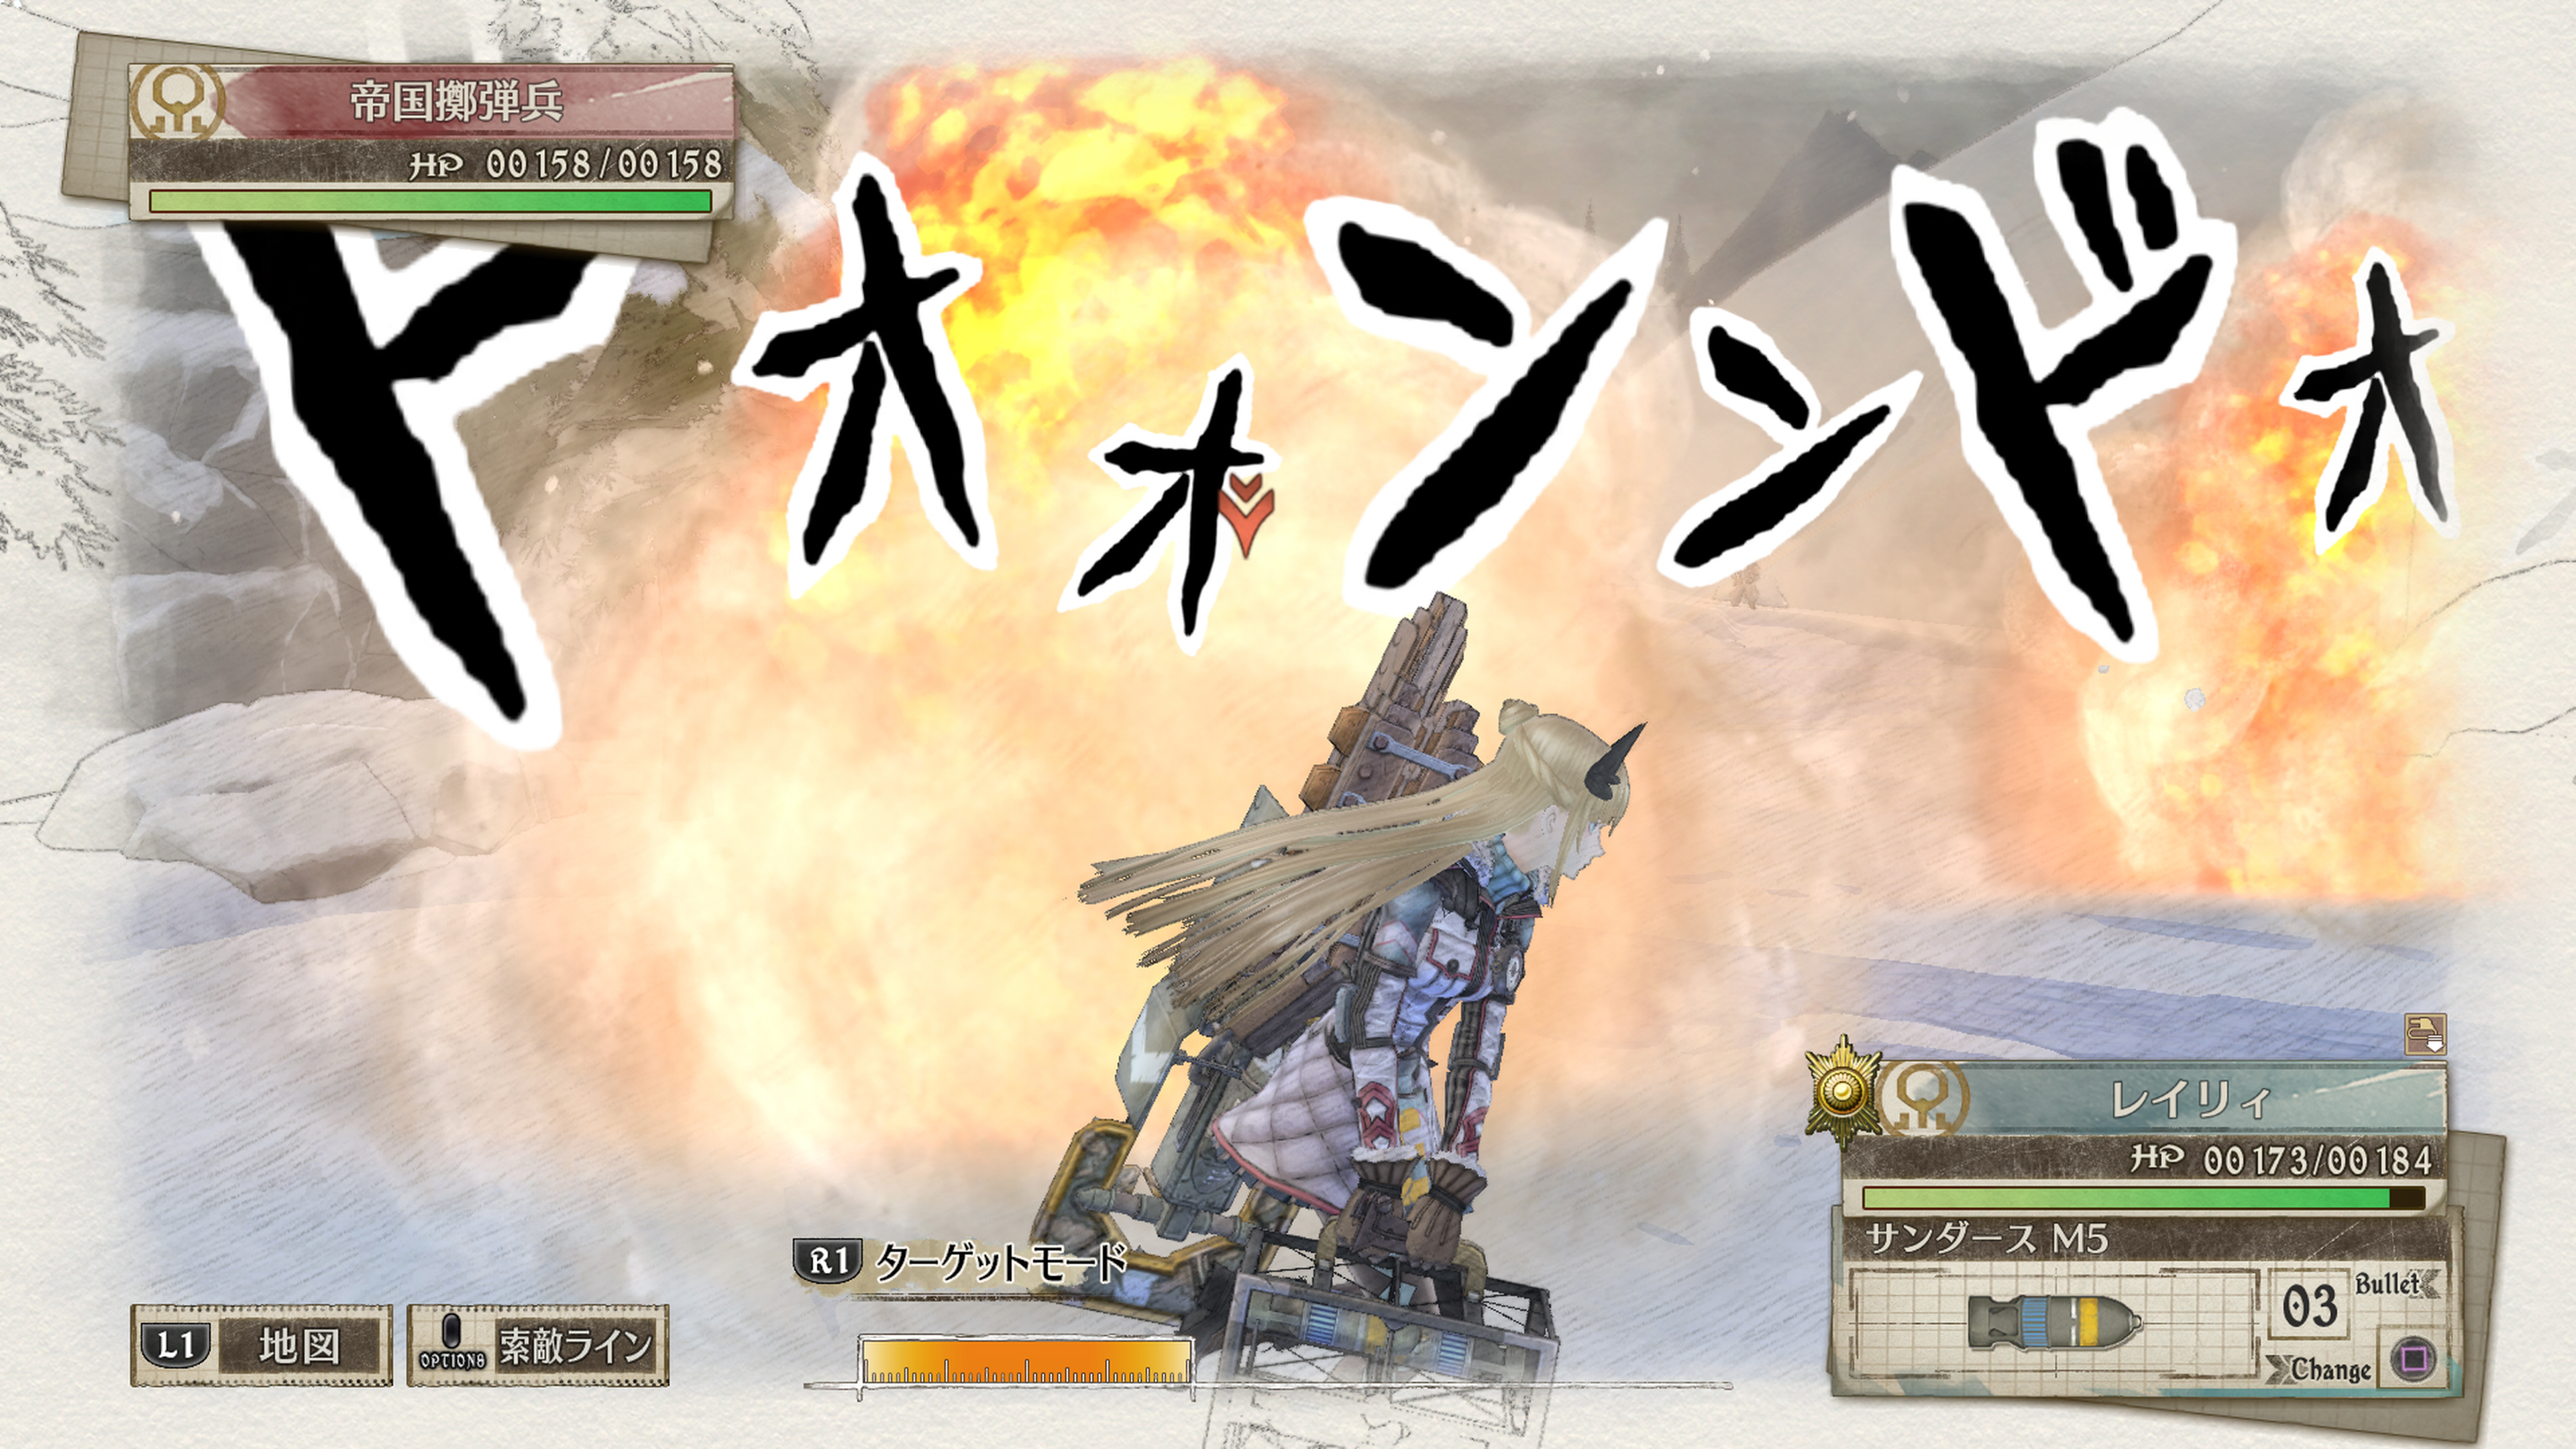 Valkyria Chronicles 4 - combat